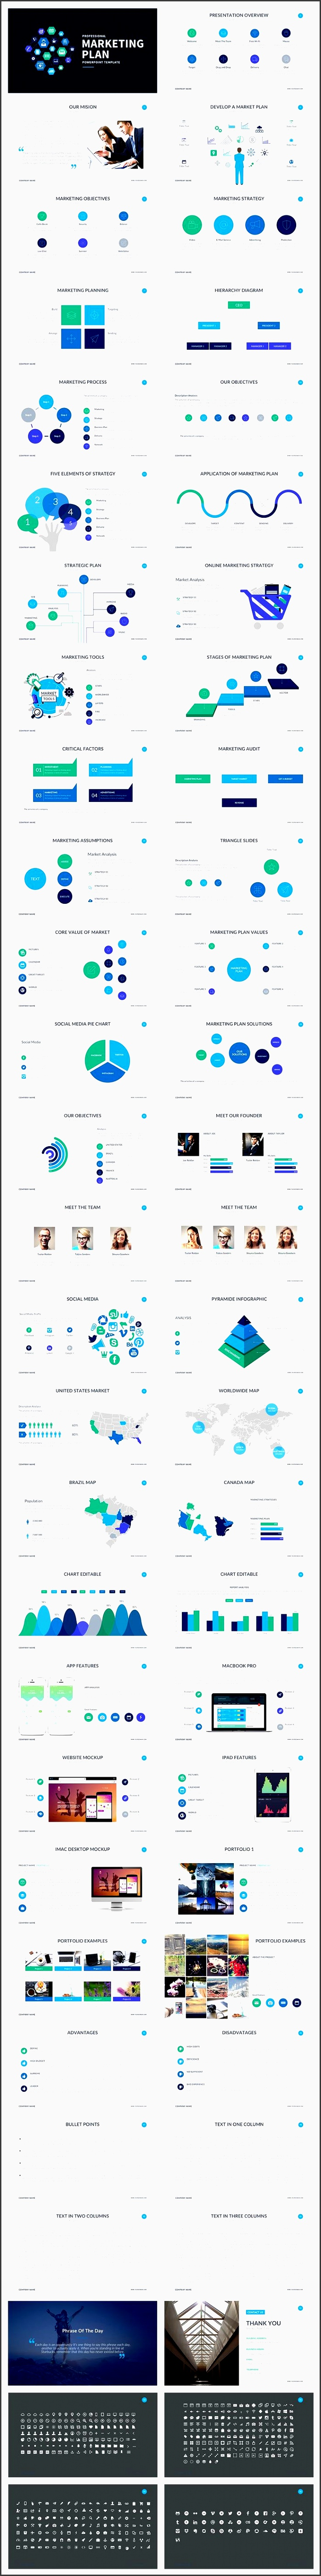 marketing plan powerpoint template by slidepro on creativemarket